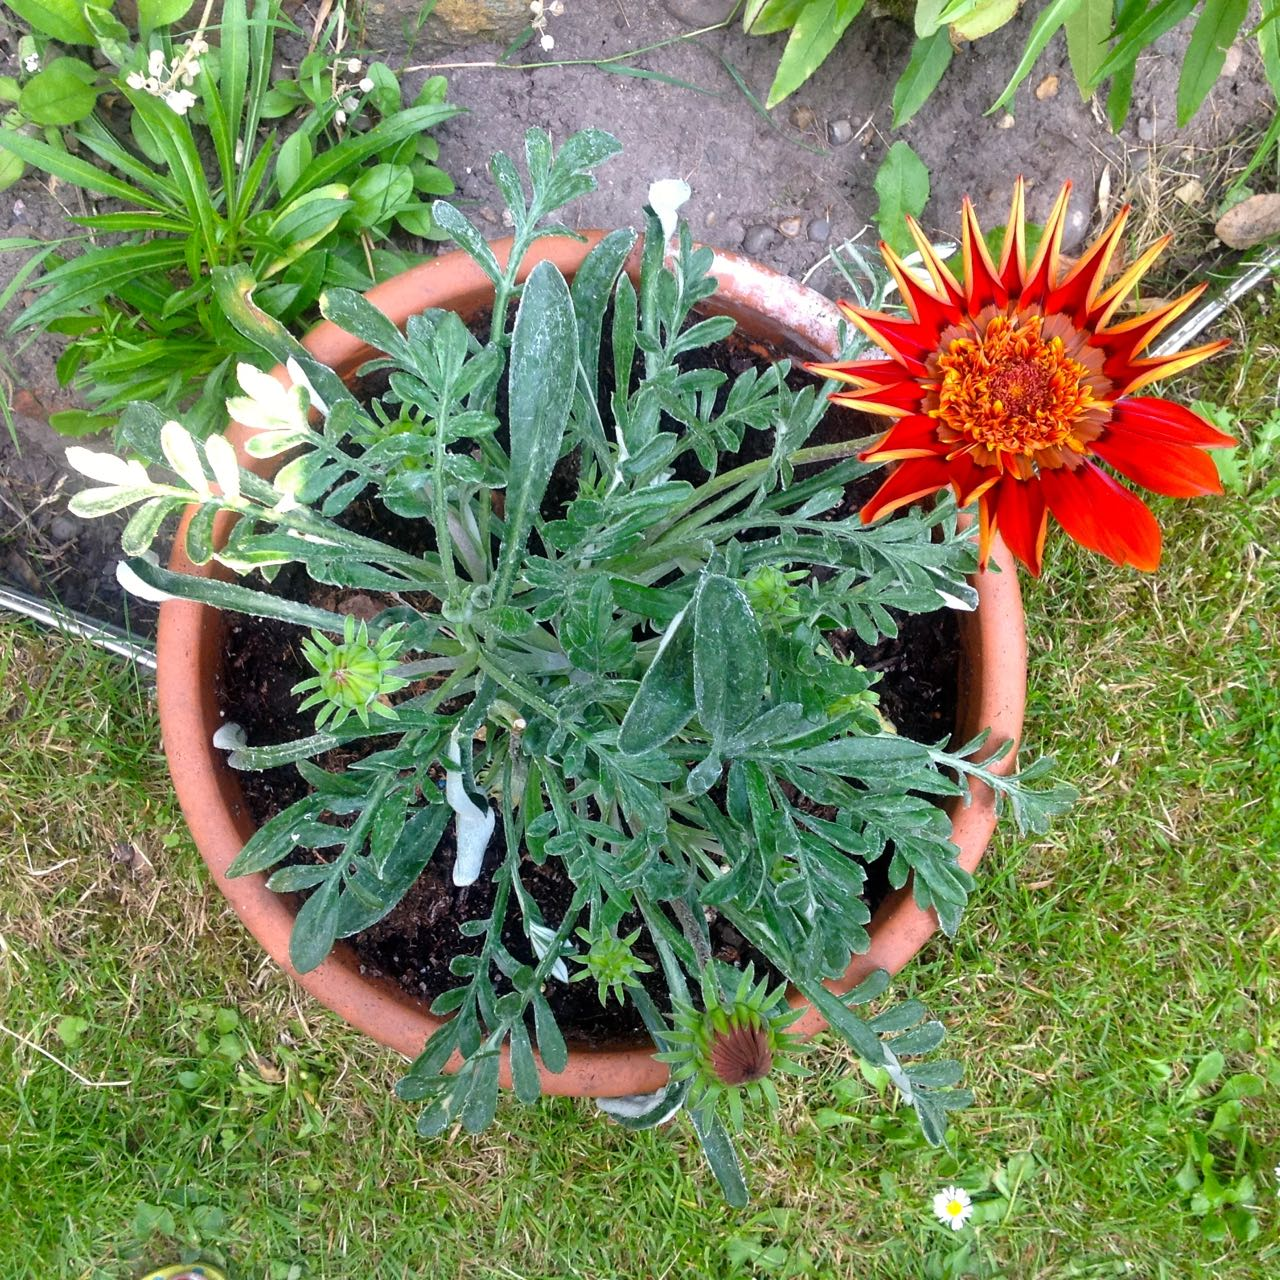 One plant per pot - impact planting with this sun loving gazania